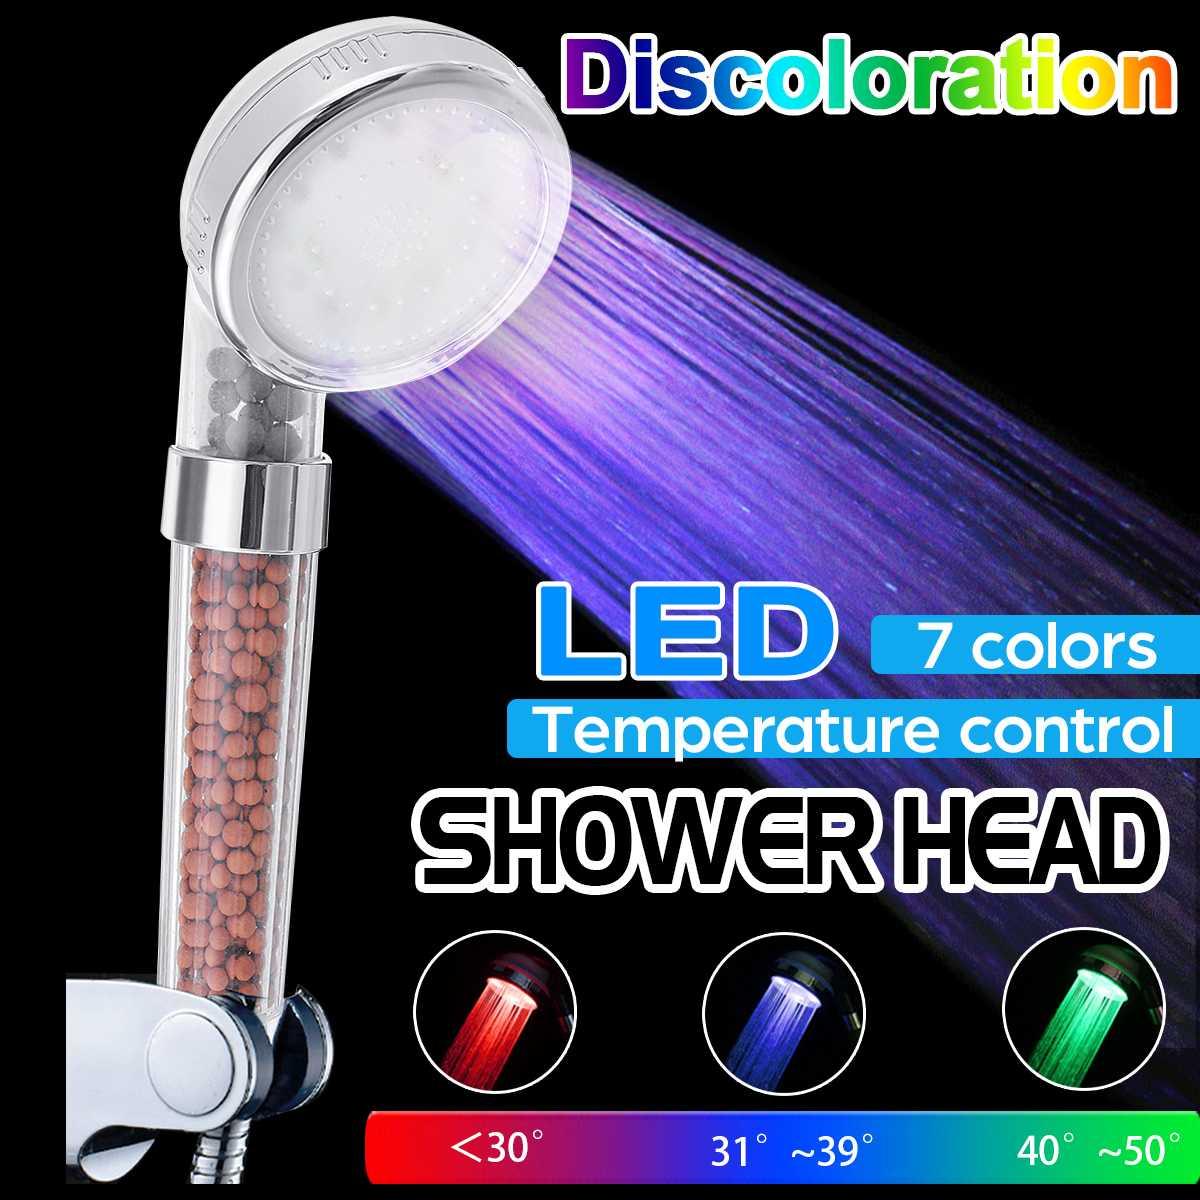 LED RGB Rainfall Bath Shower 7 Color Changing Shower Head High Pressure Saving Water Bathroom Anion Filter Shower SPA Nozzle